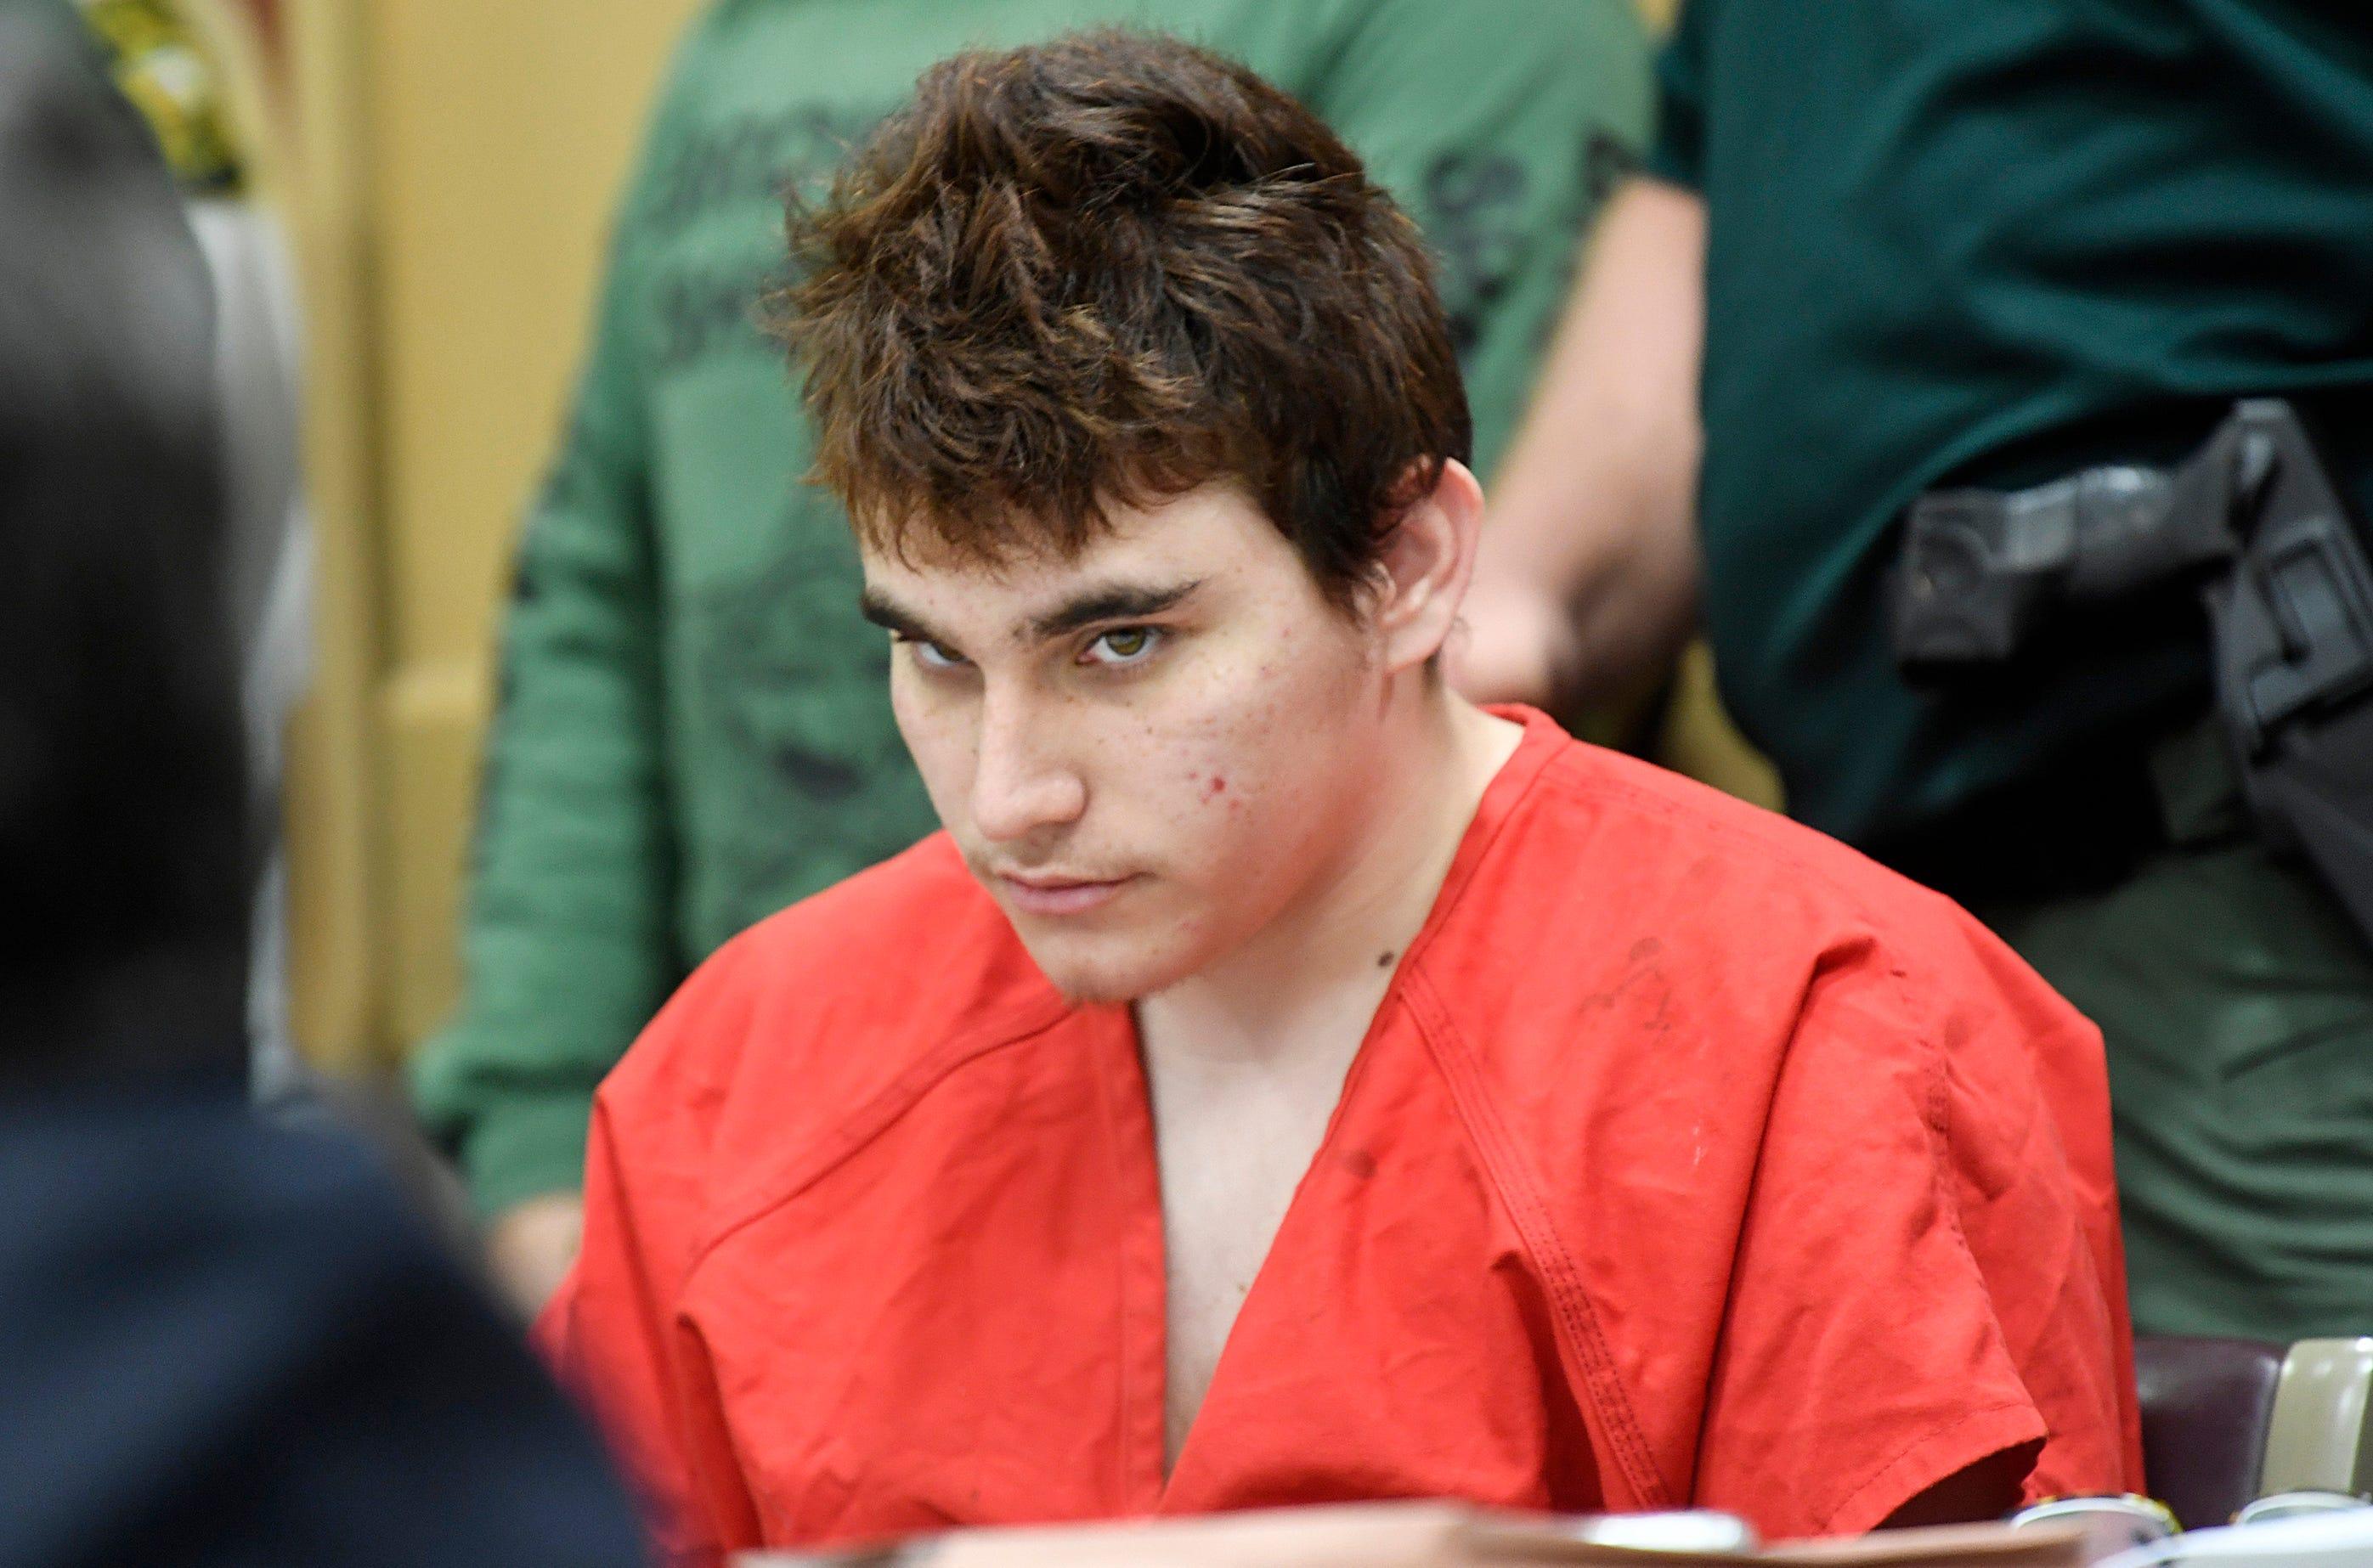 'Burn, kill, destroy': Parkland school shooter video released